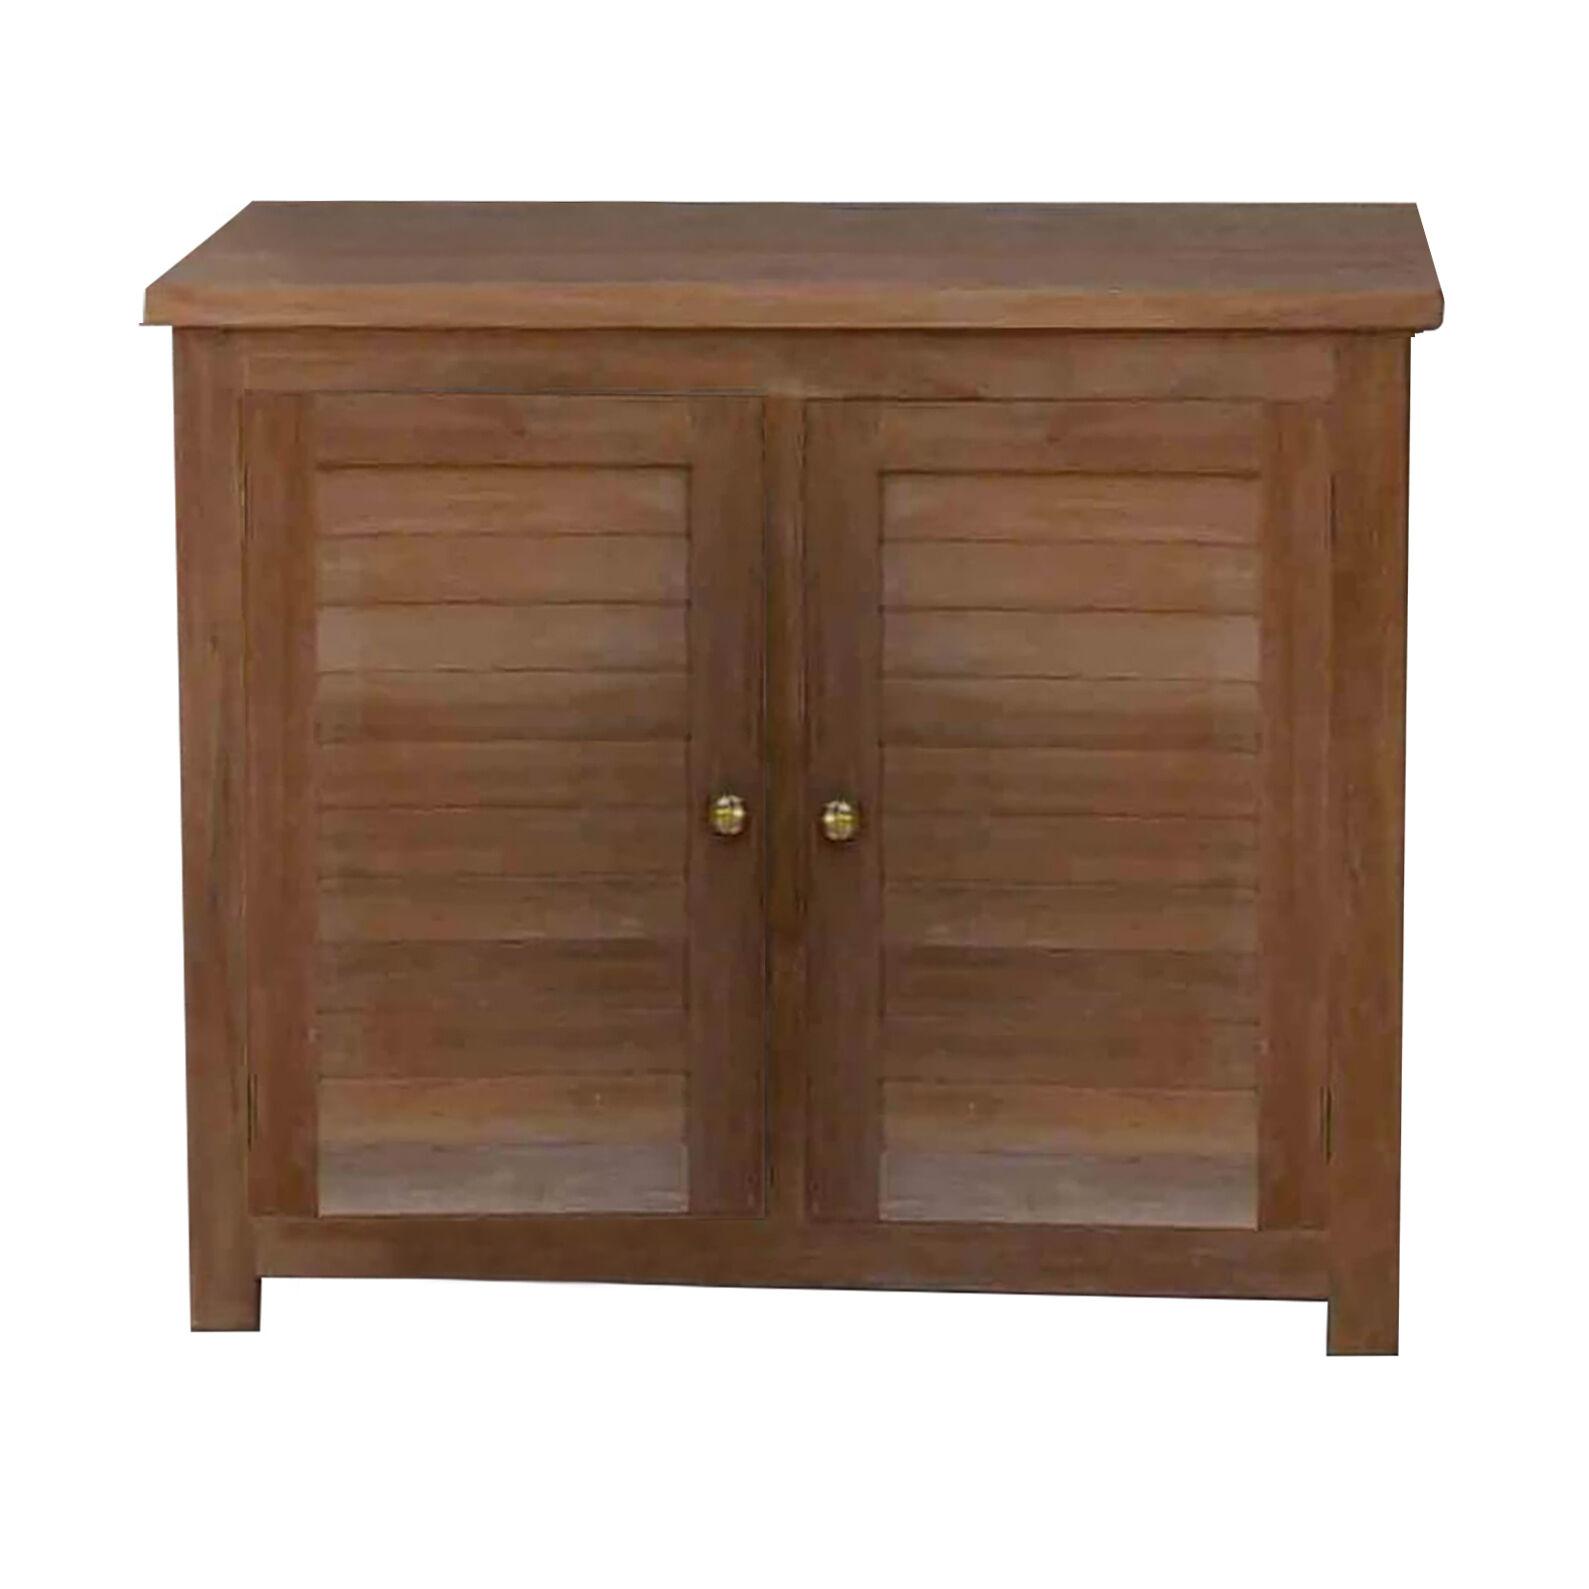 Milani Home PARADIGMA - mobile da giardino in legno di teak 90 x 45